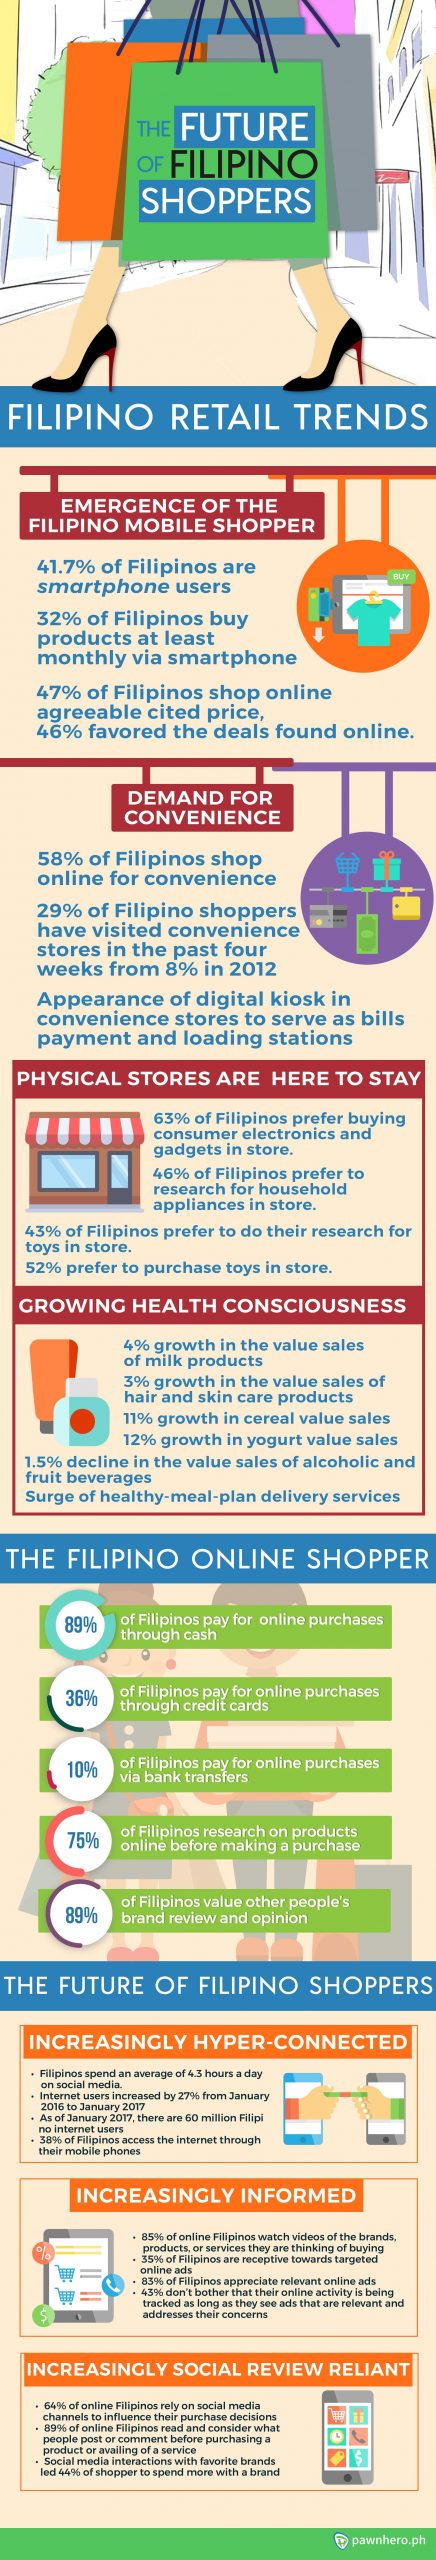 BLOG_INFOGRAPHIC_FUTURE-FILIPINO-SHOPPERS